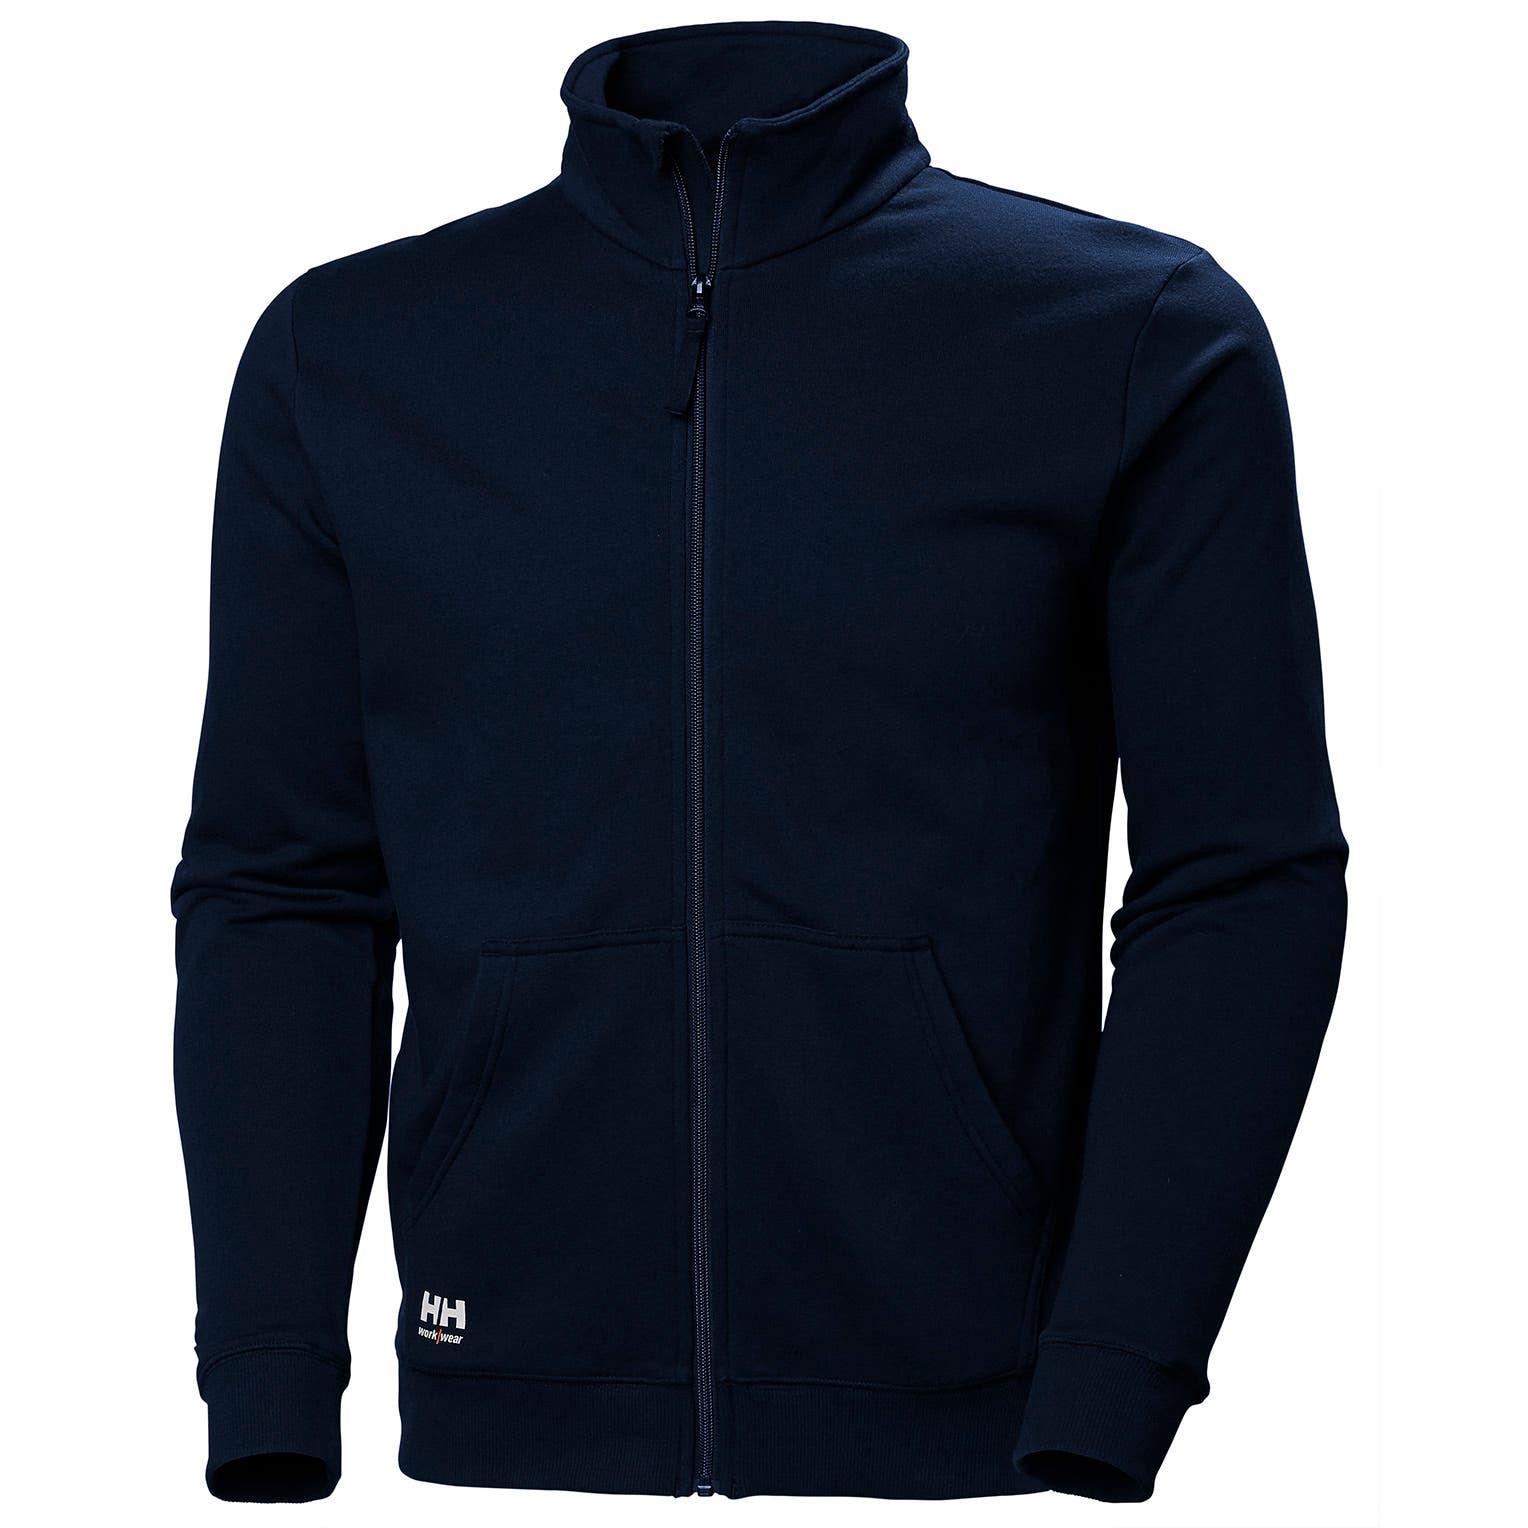 Свитшот на молнии Helly Hansen Manchester Zip Sweatshirt - 79212 (Navy; M)